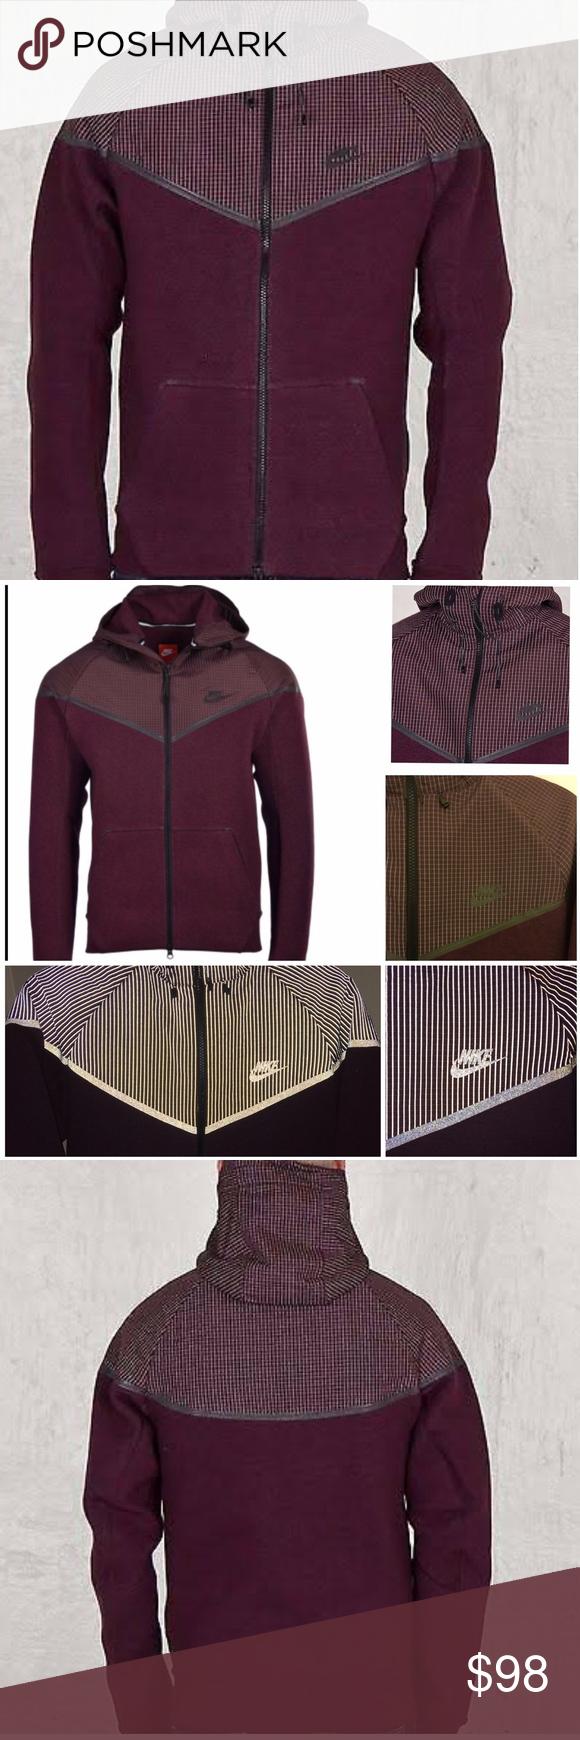 Nwt nike tech fleece windrunner jacket new w tags style